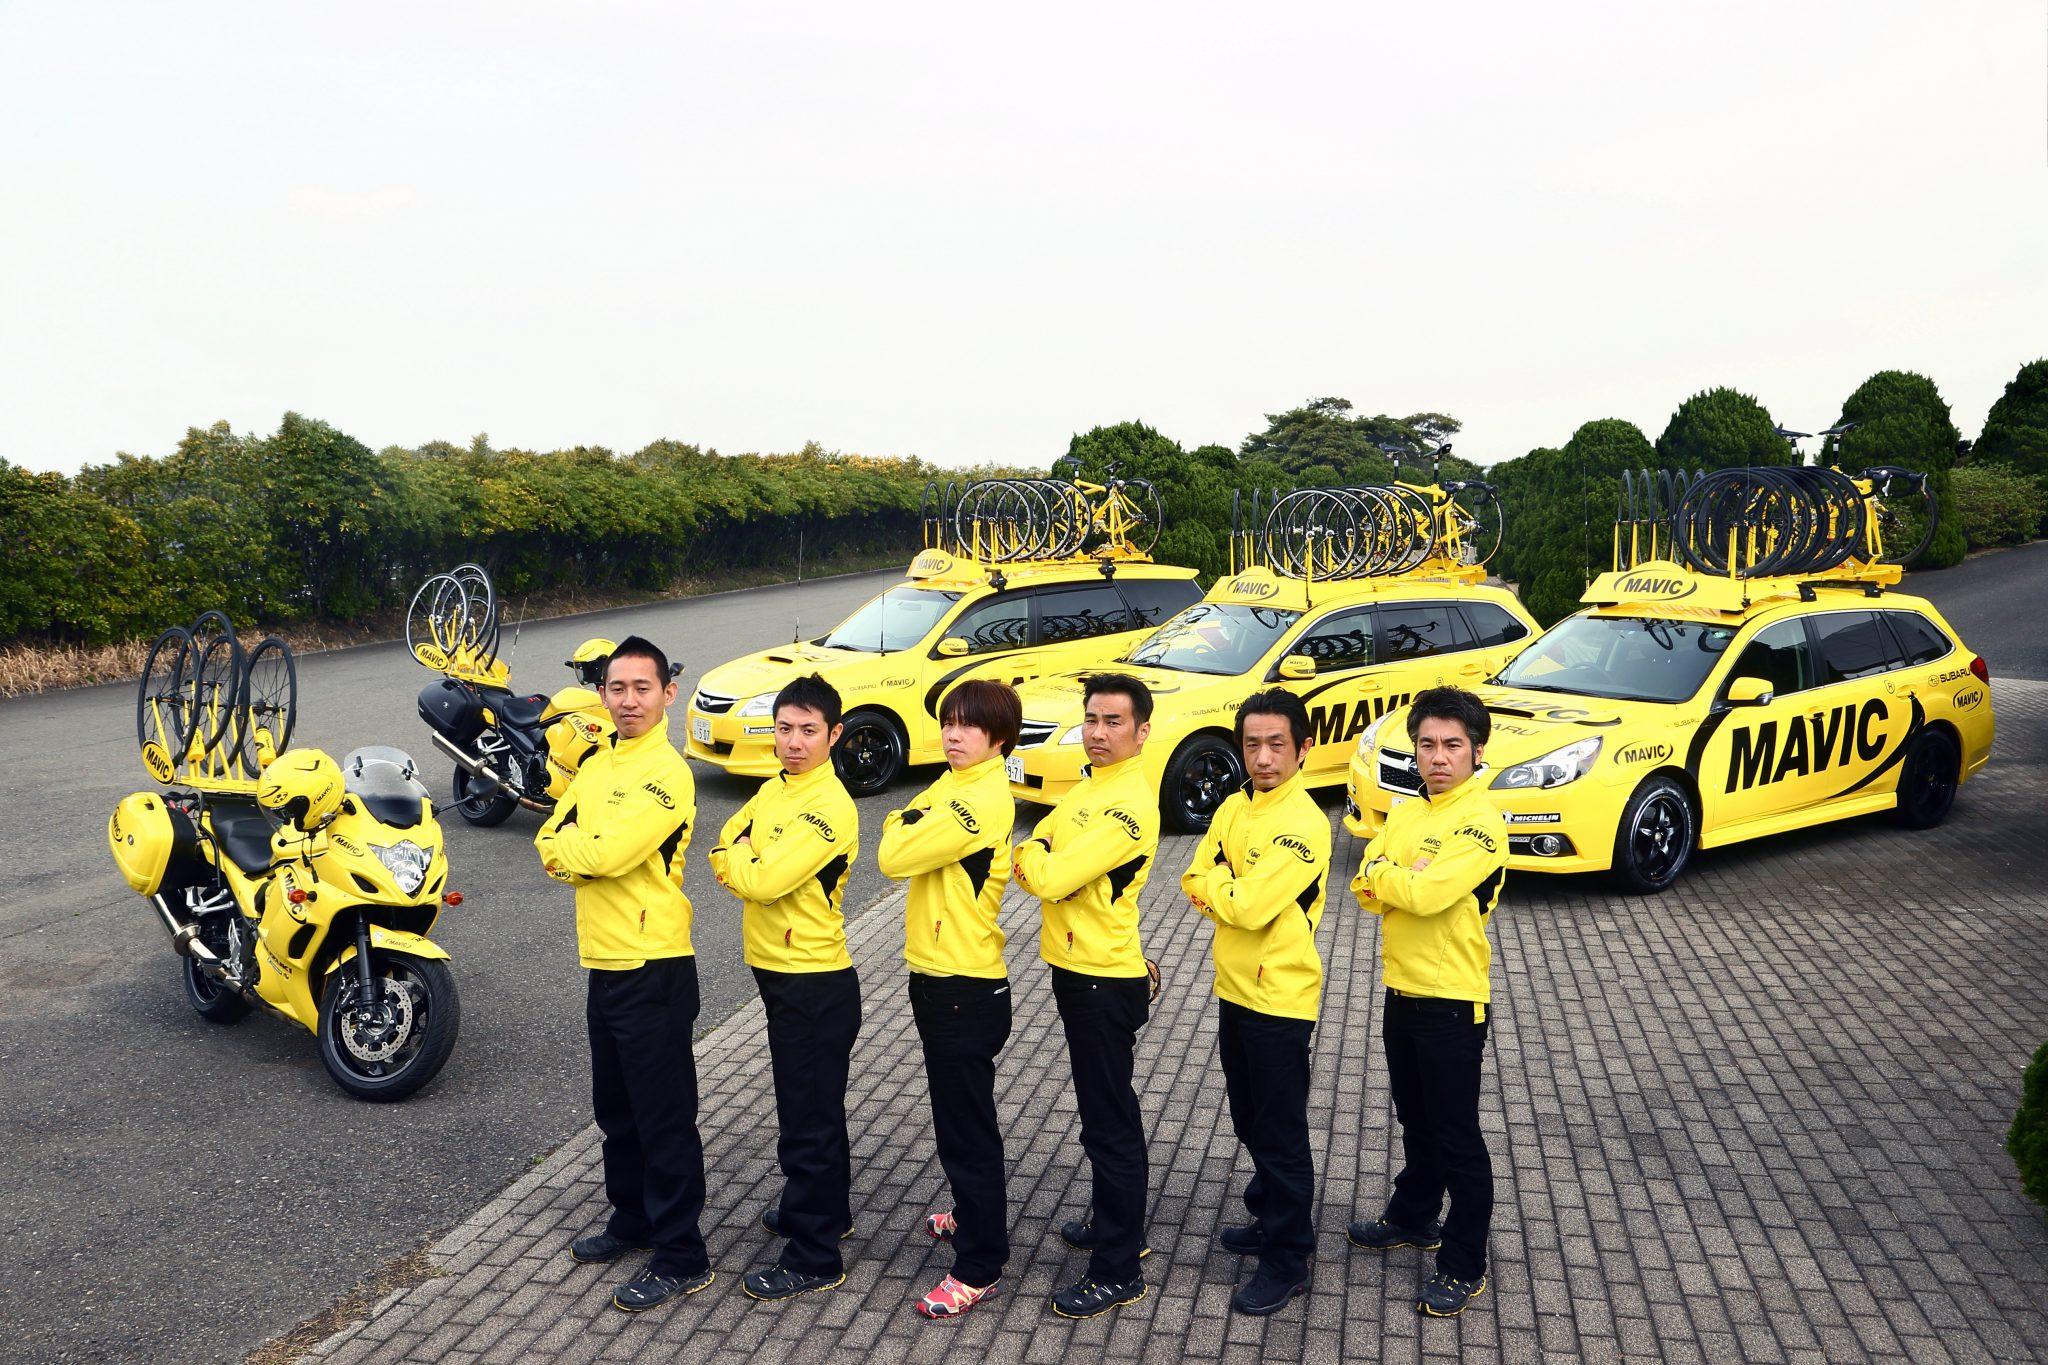 MOTO MAVIC CARS_Staff_2